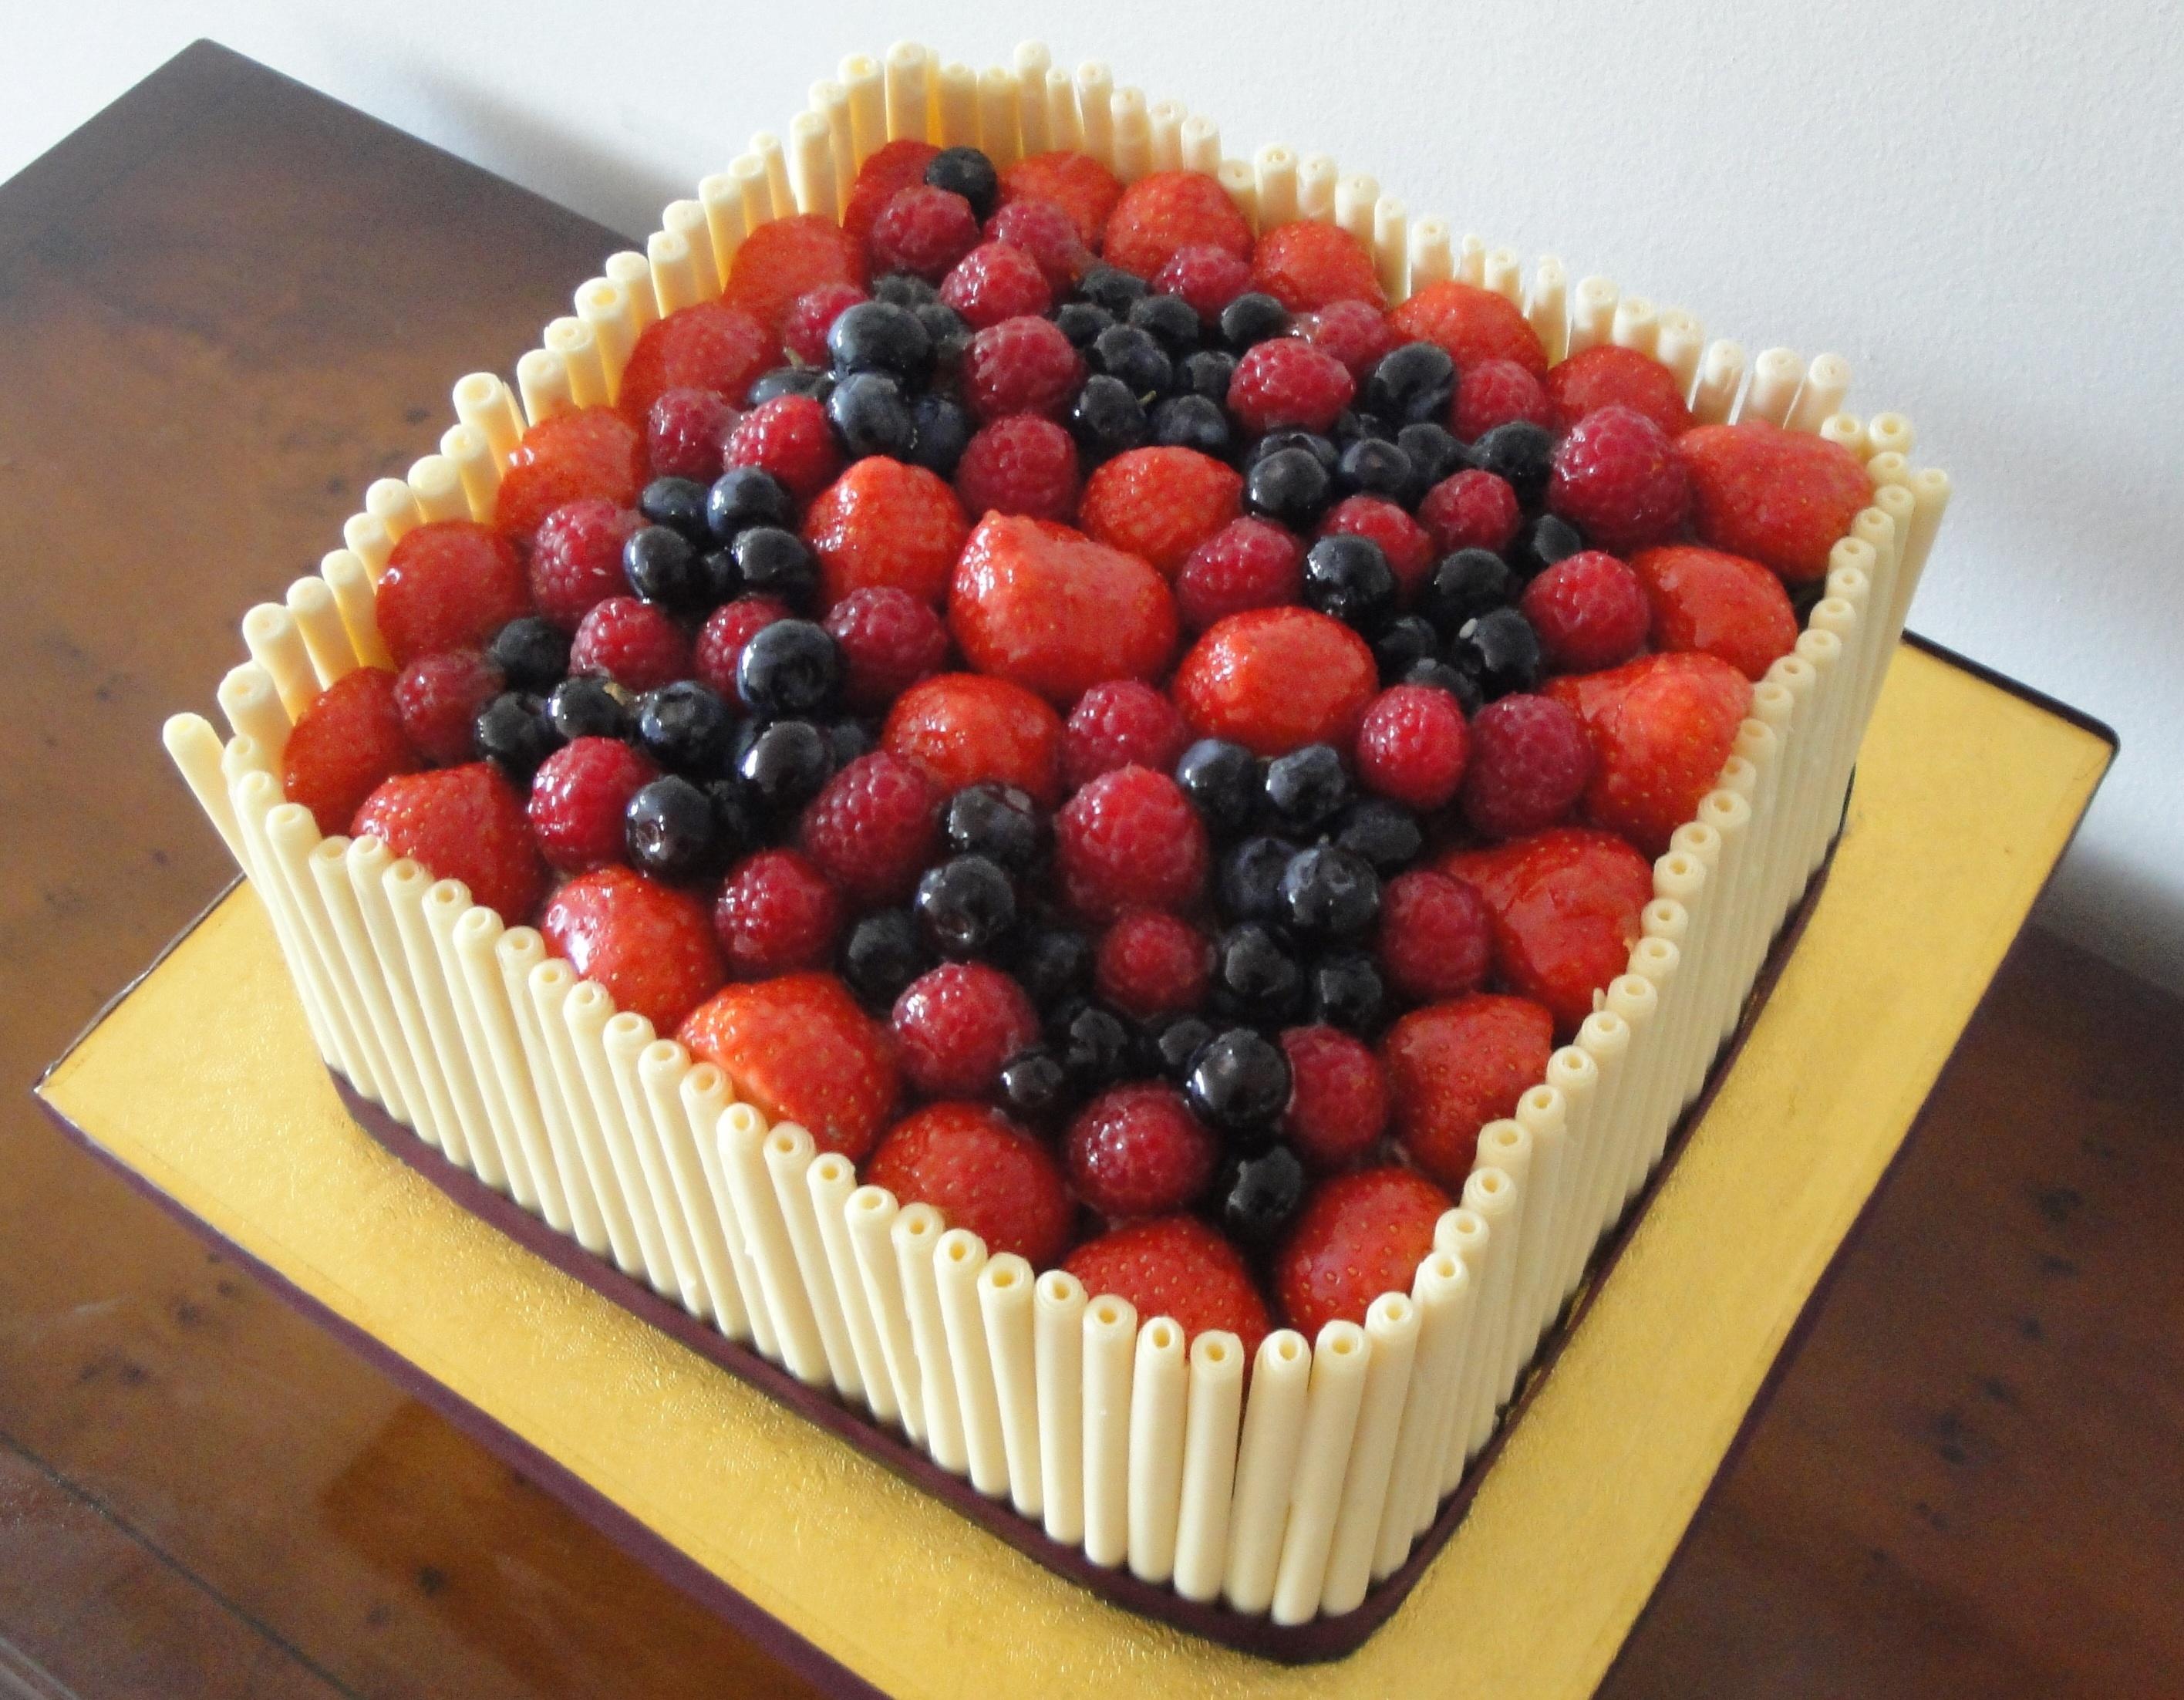 Ghaumour Design Decorative Bespoke Cakes & Catering ...